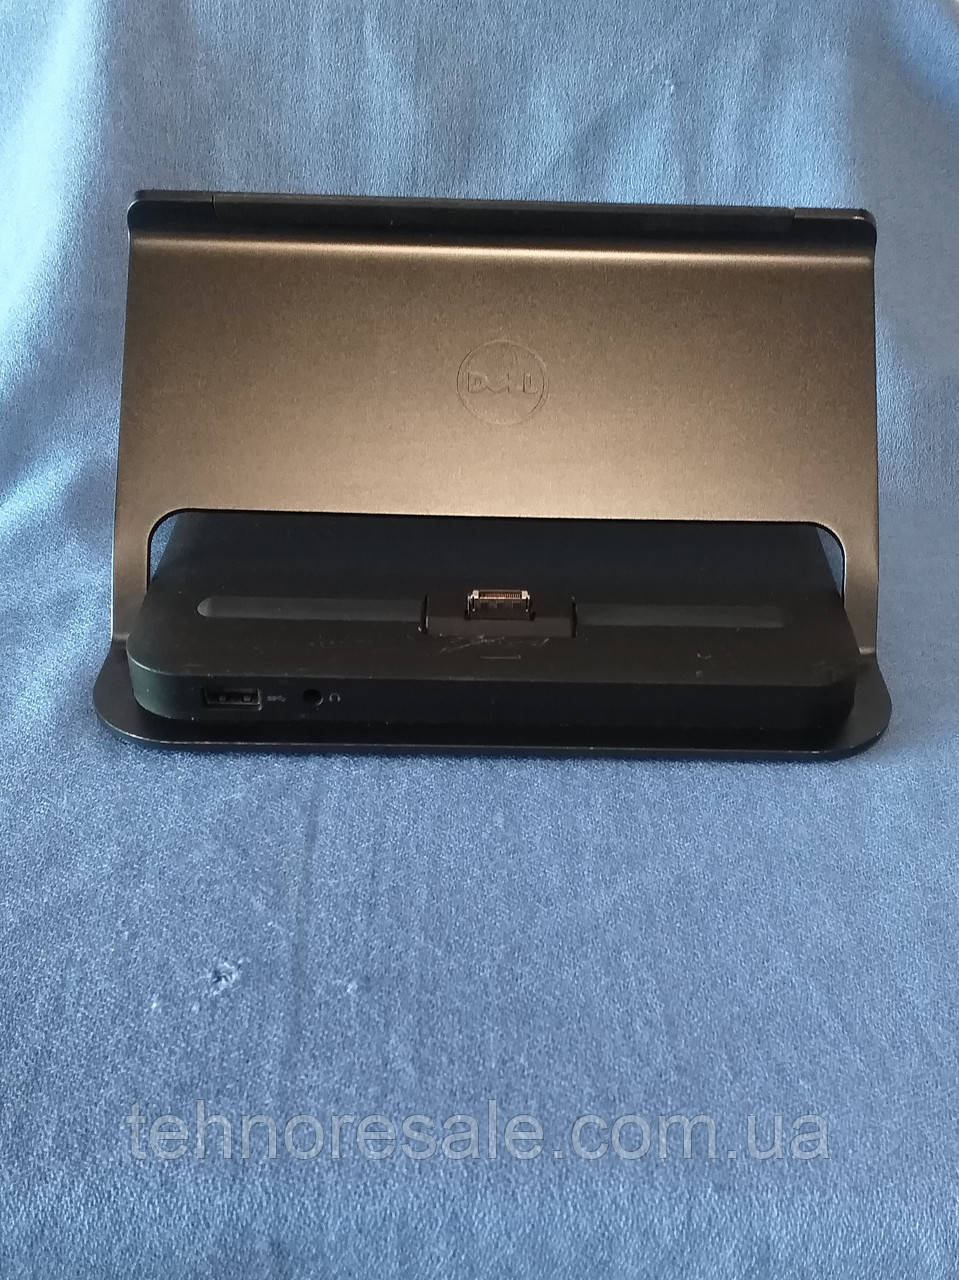 Докстанція Dell Tablet Dock K10A для планшету Dell Venue 11 pro 5130 7130 7139 7140 та Latitude 5175 5179 7350